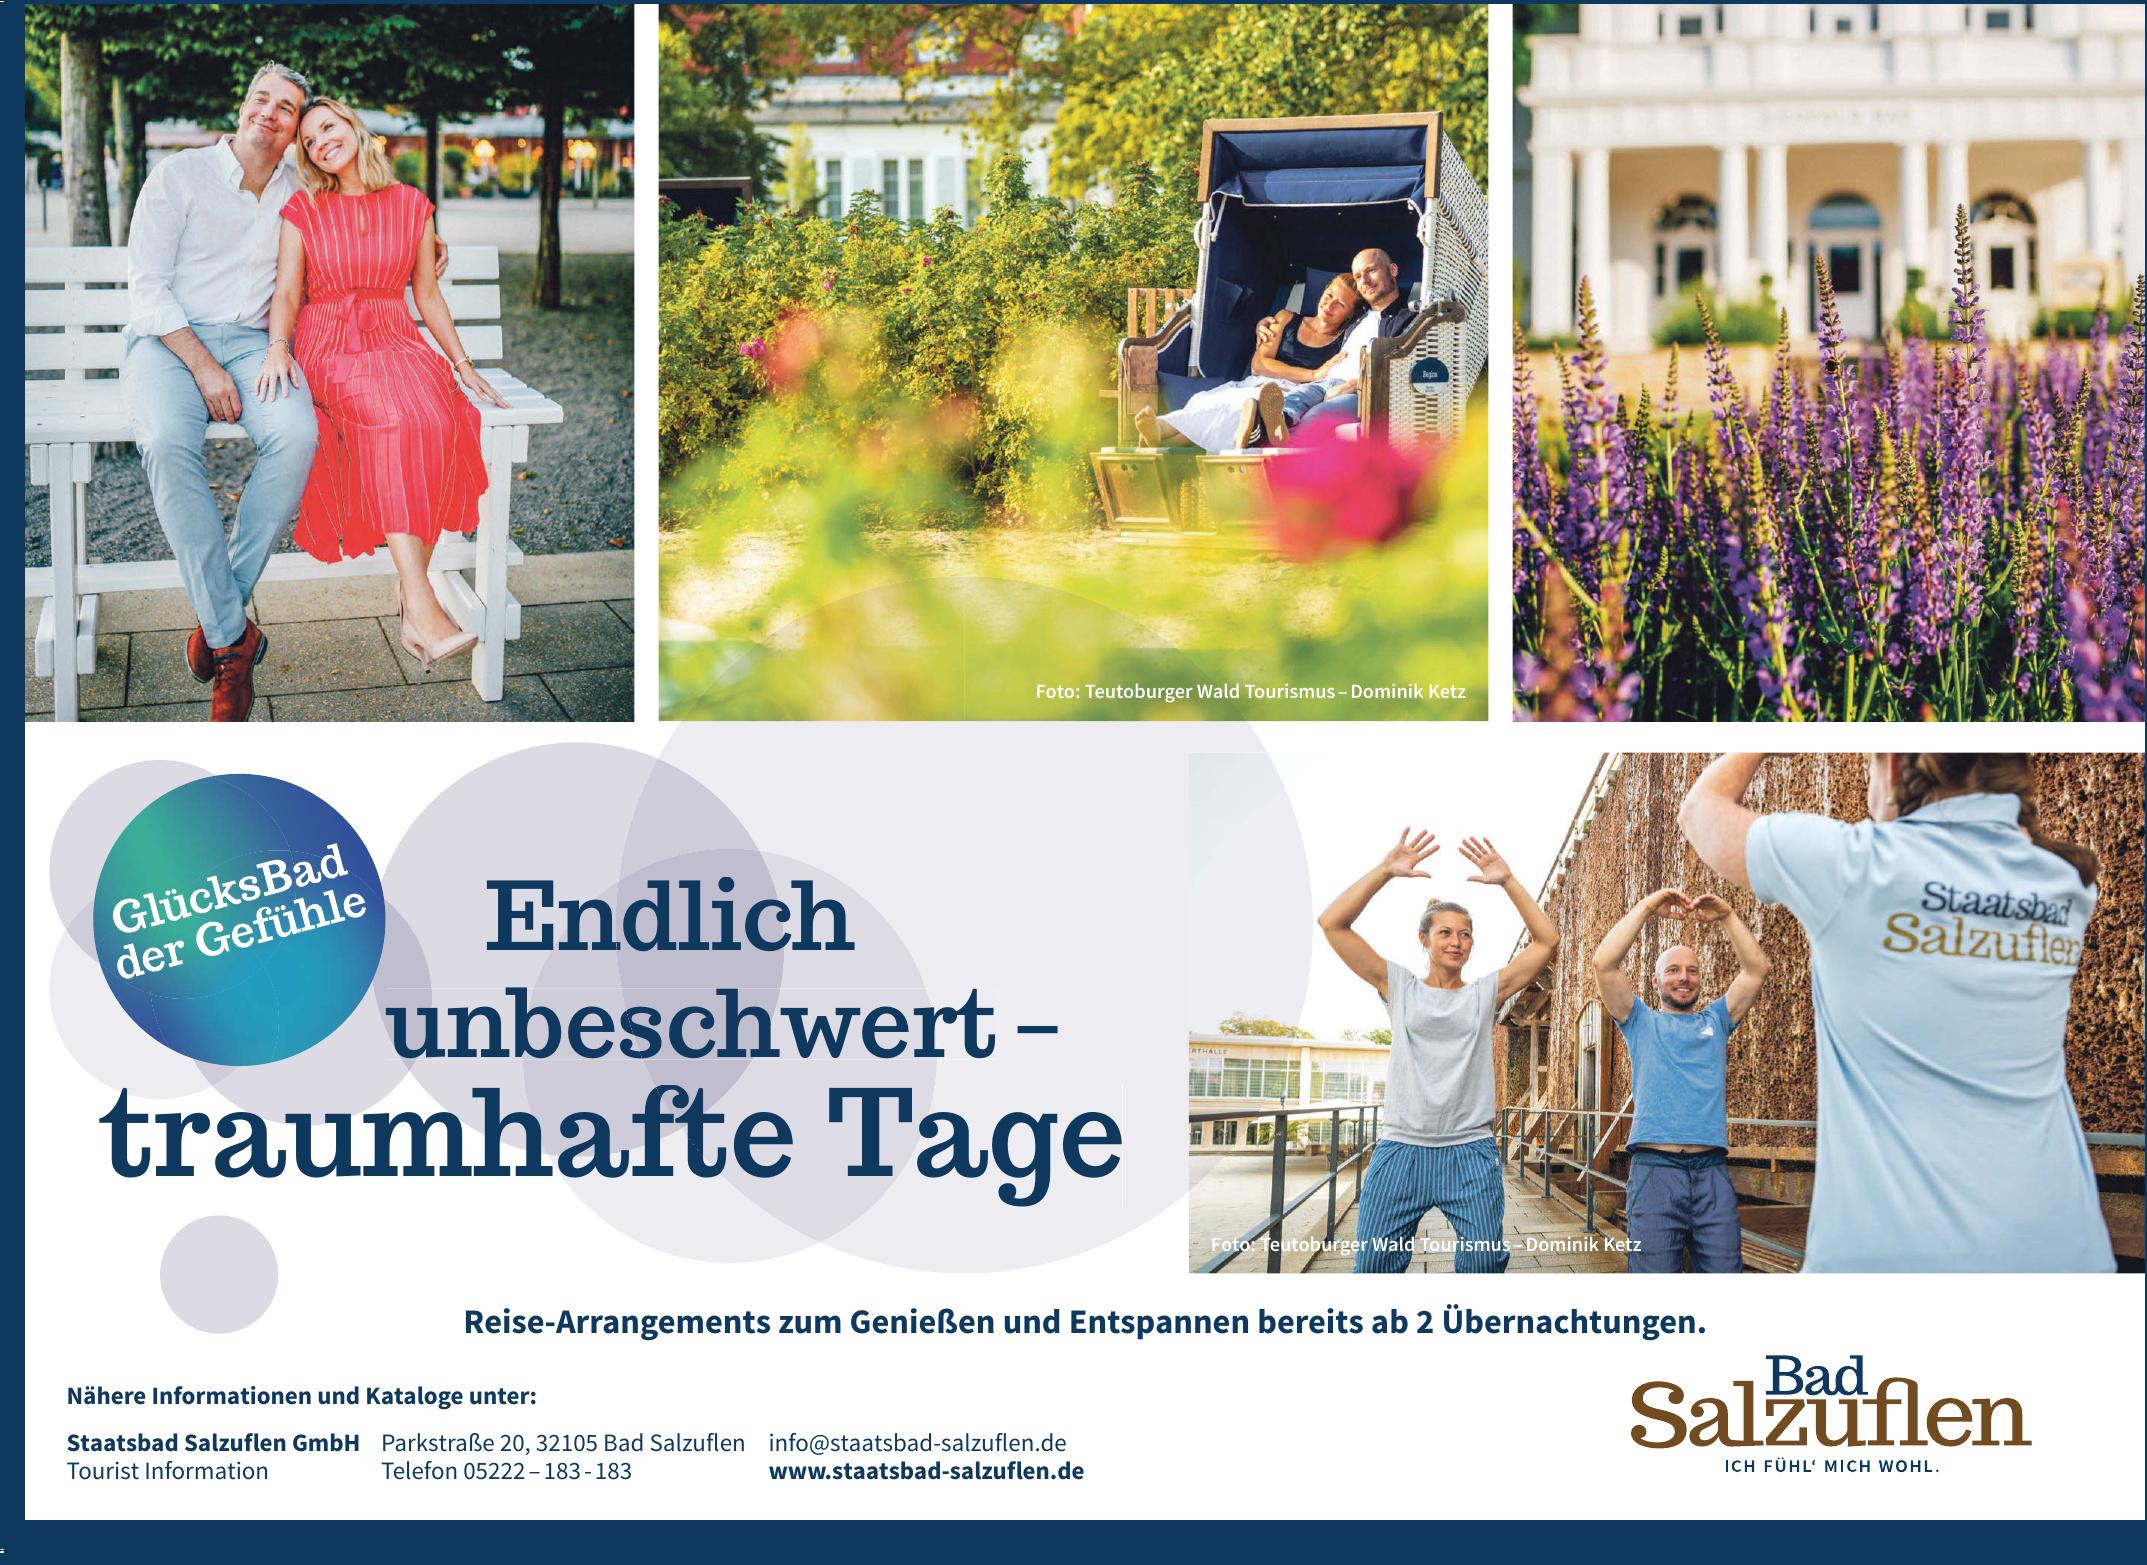 Staatsbad Salzuflen GmbH